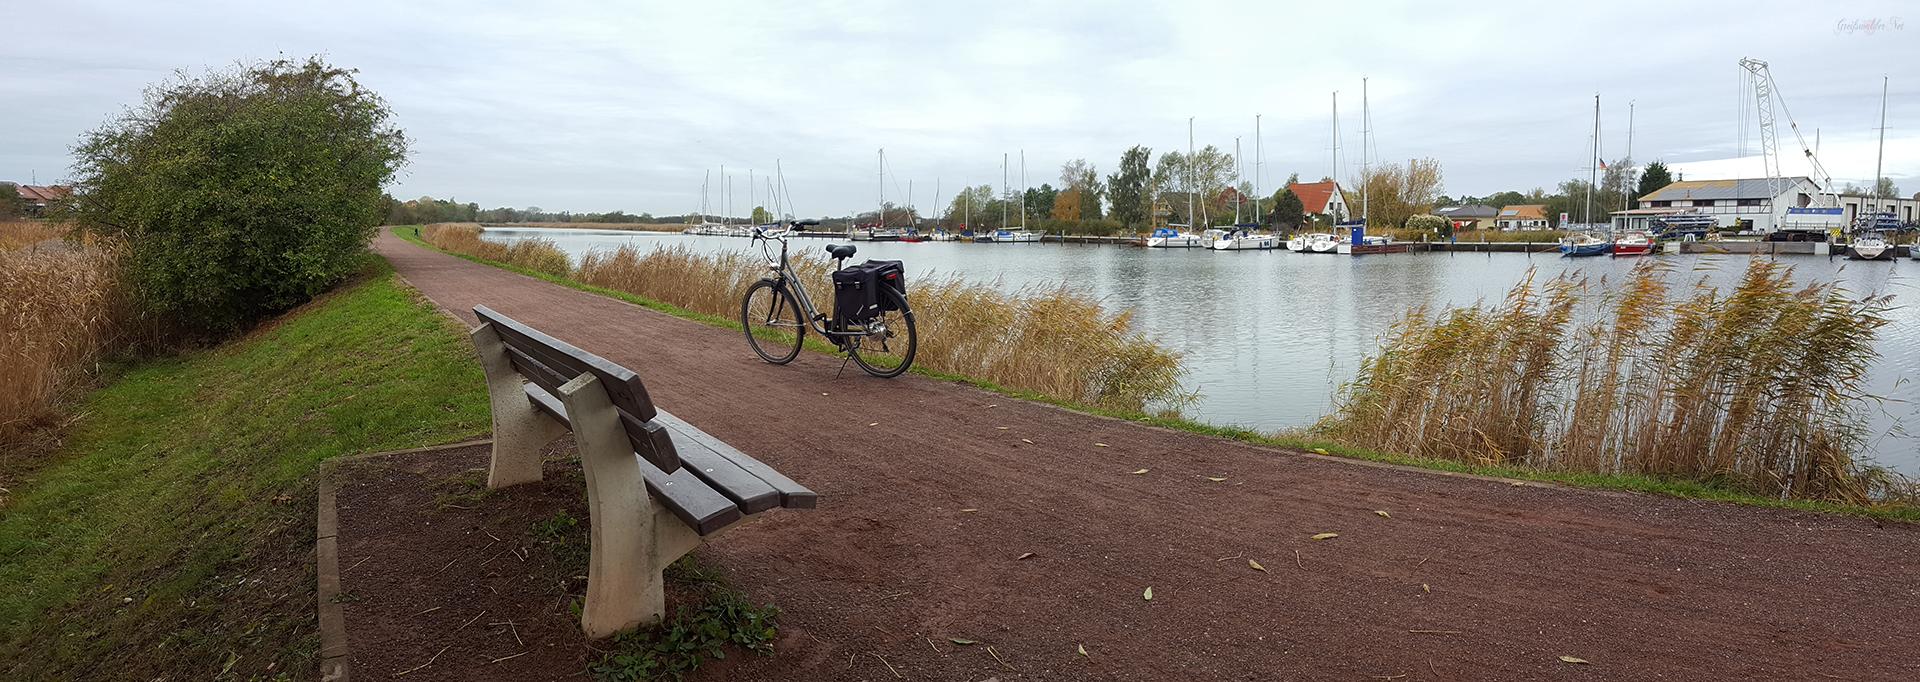 Treidelpfad am Ryck in Greifswald